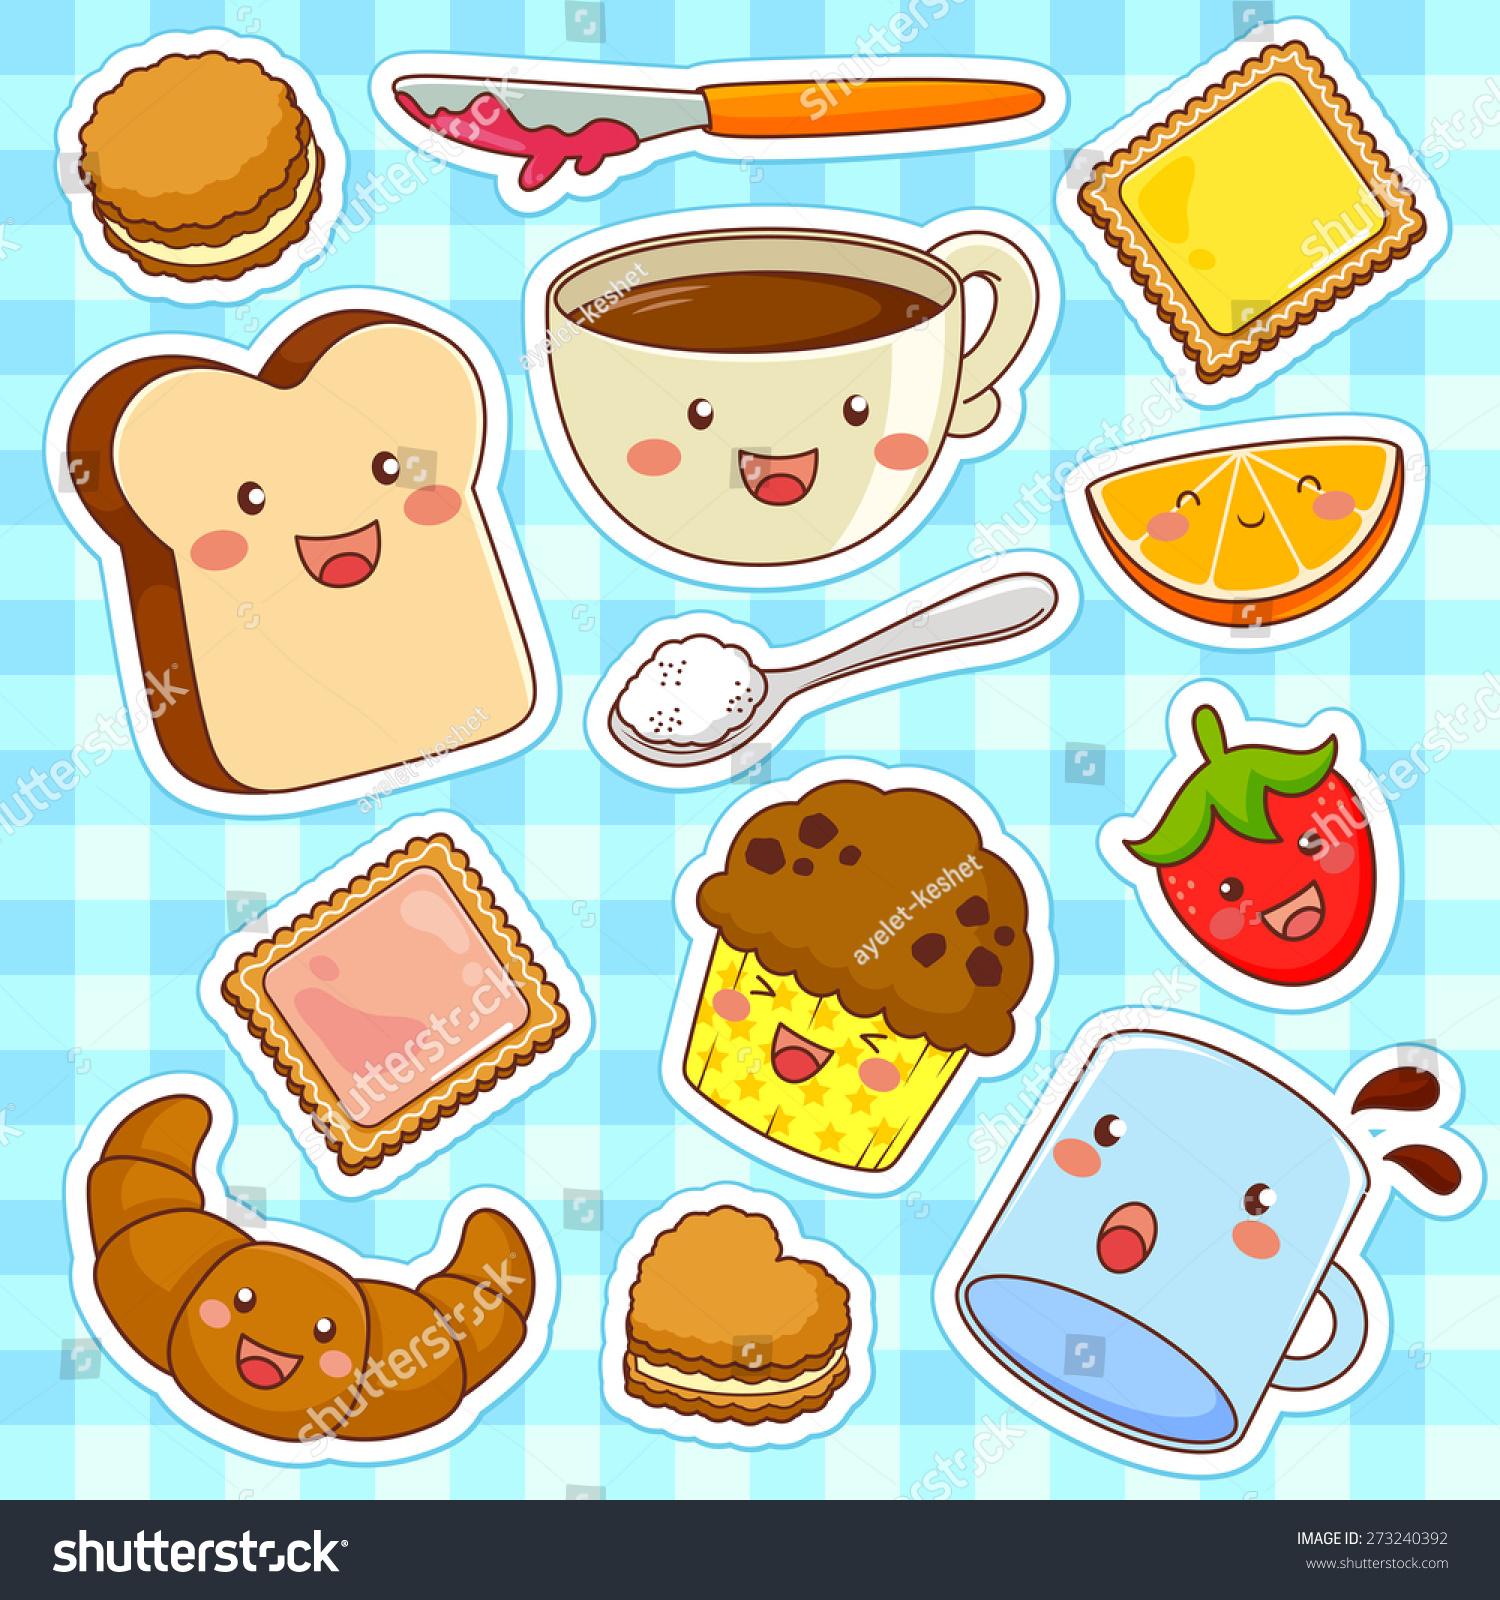 Uncategorized Cute Kawaii Food cute kawaii style cartoon foods stock vector 273240392 shutterstock foods